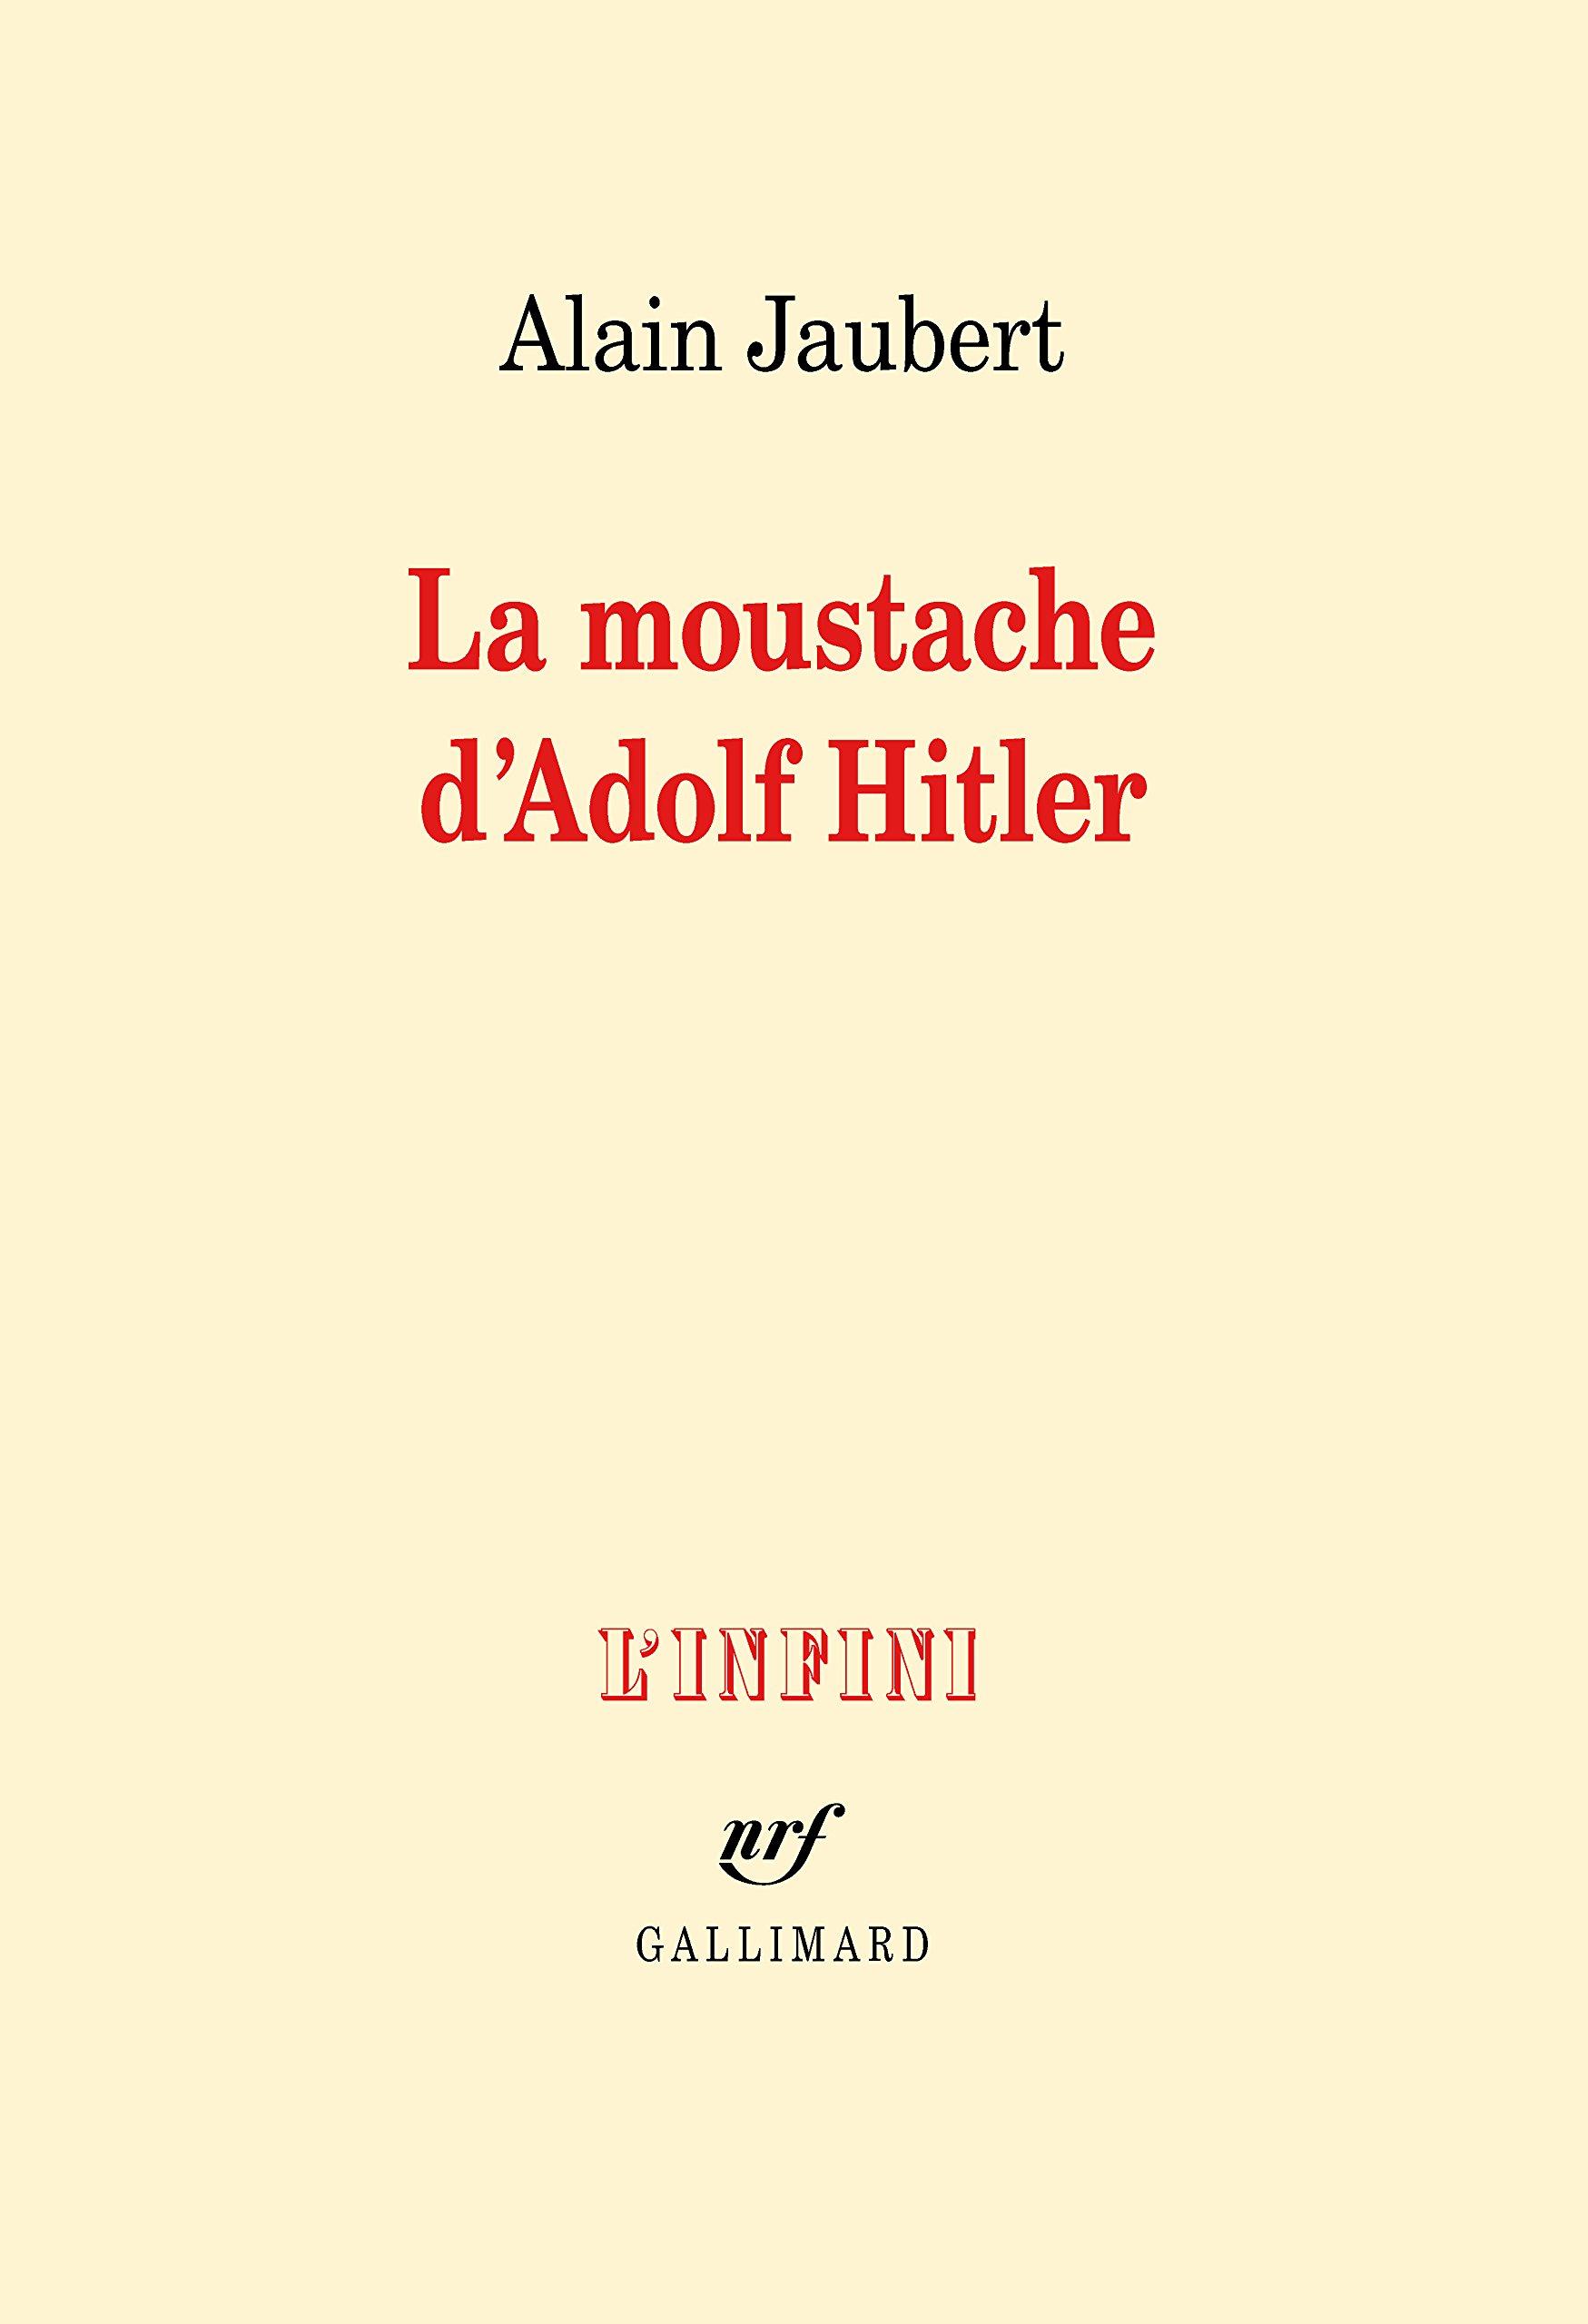 La moustache d'Adolf Hitler - Alain Jaubert